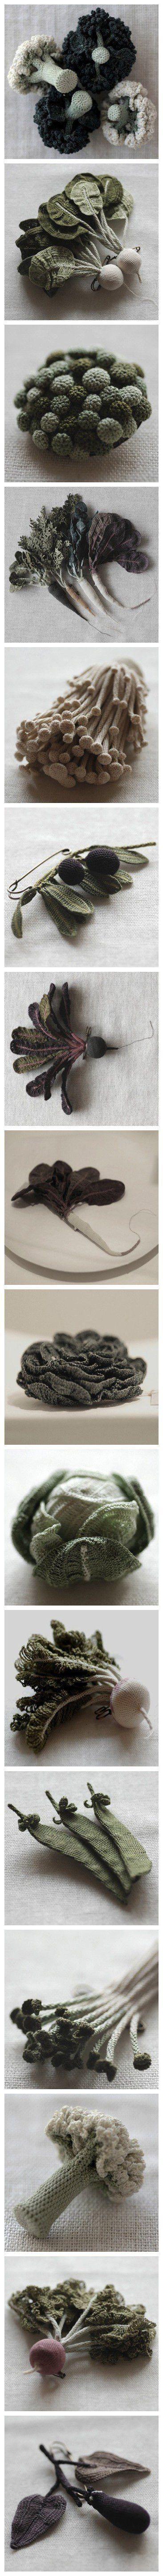 amazing crochet vegetables!